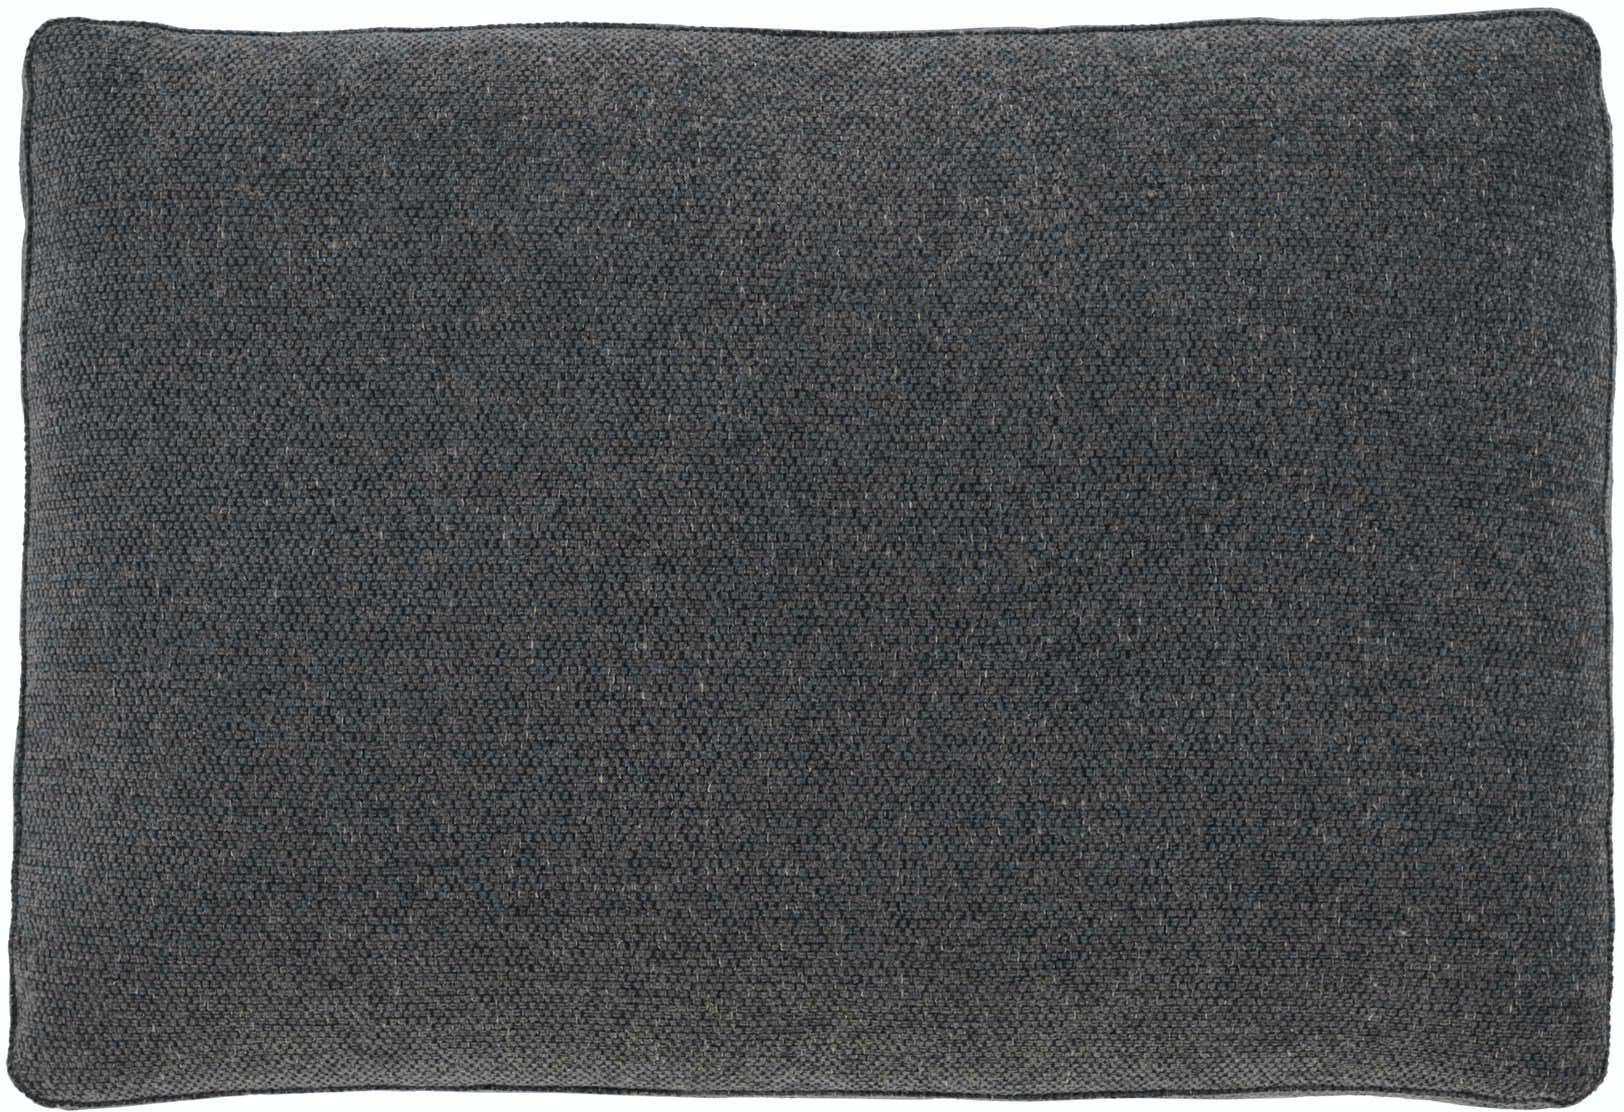 Køb Blok, Sofa tilbehørspude, Stof by LaForma (H: 40 cm. B: 60 cm. L: 15 cm., Grå)